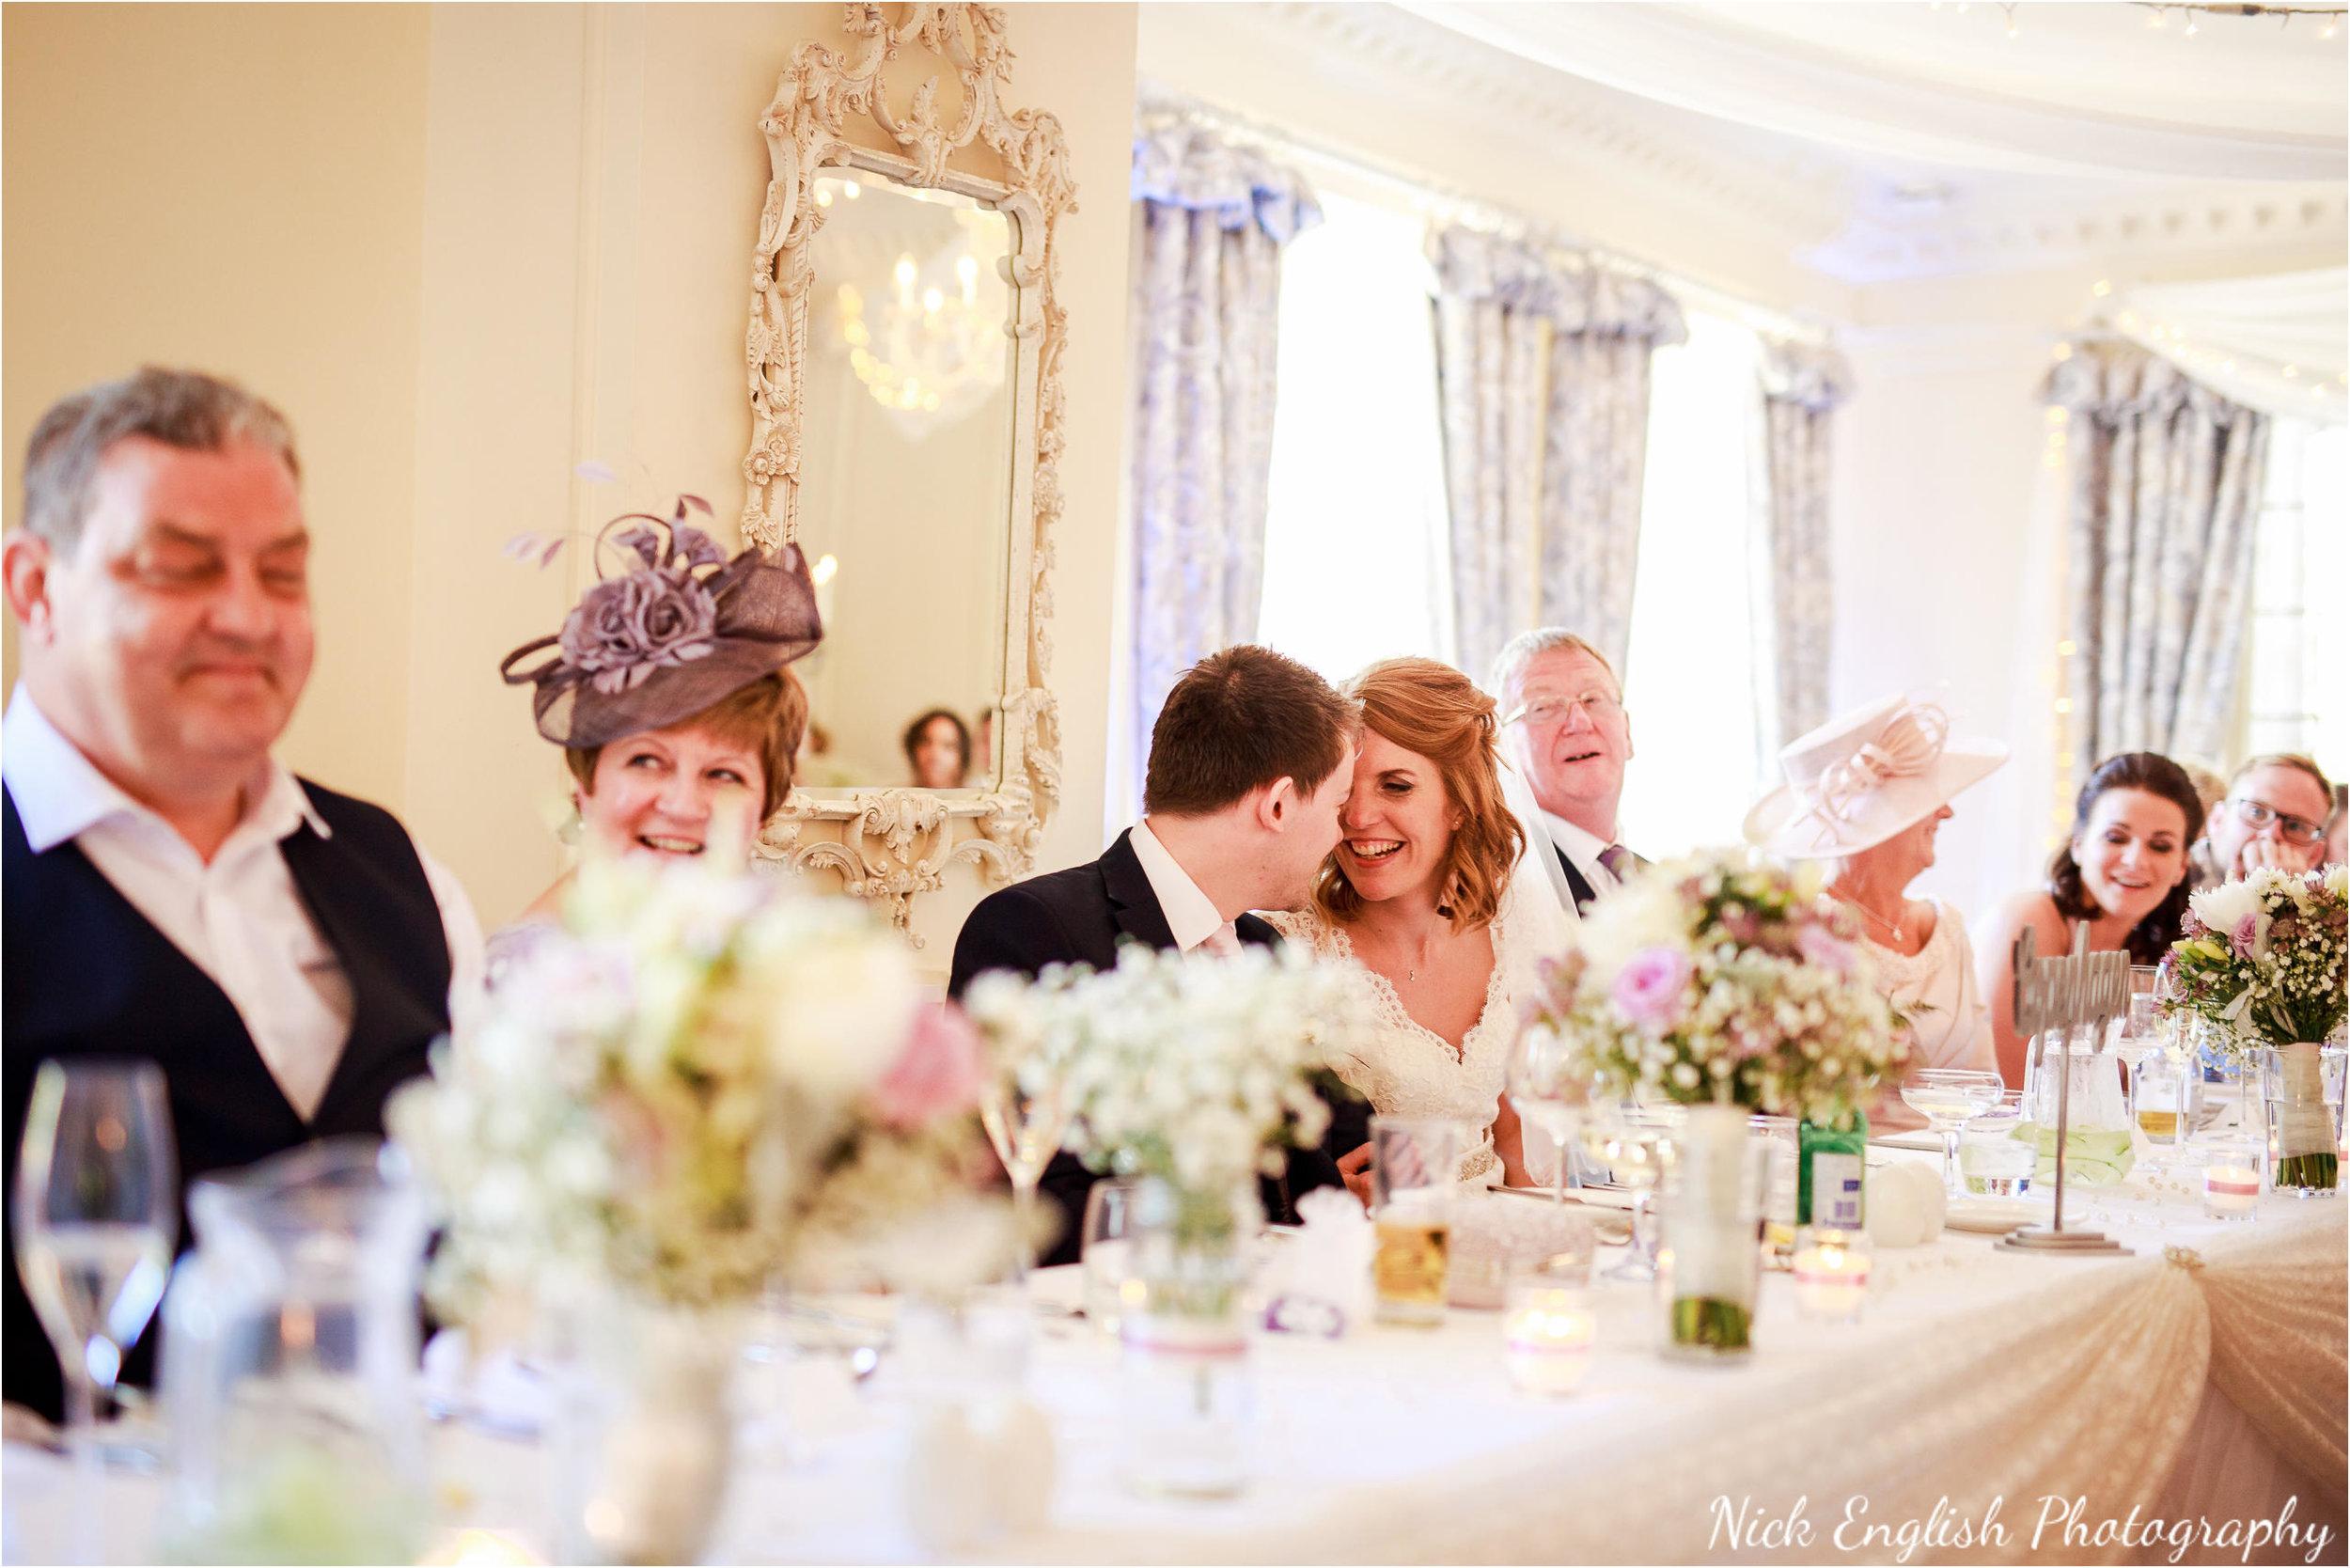 Alison James Wedding Photographs at Eaves Hall West Bradford 182jpg.jpeg